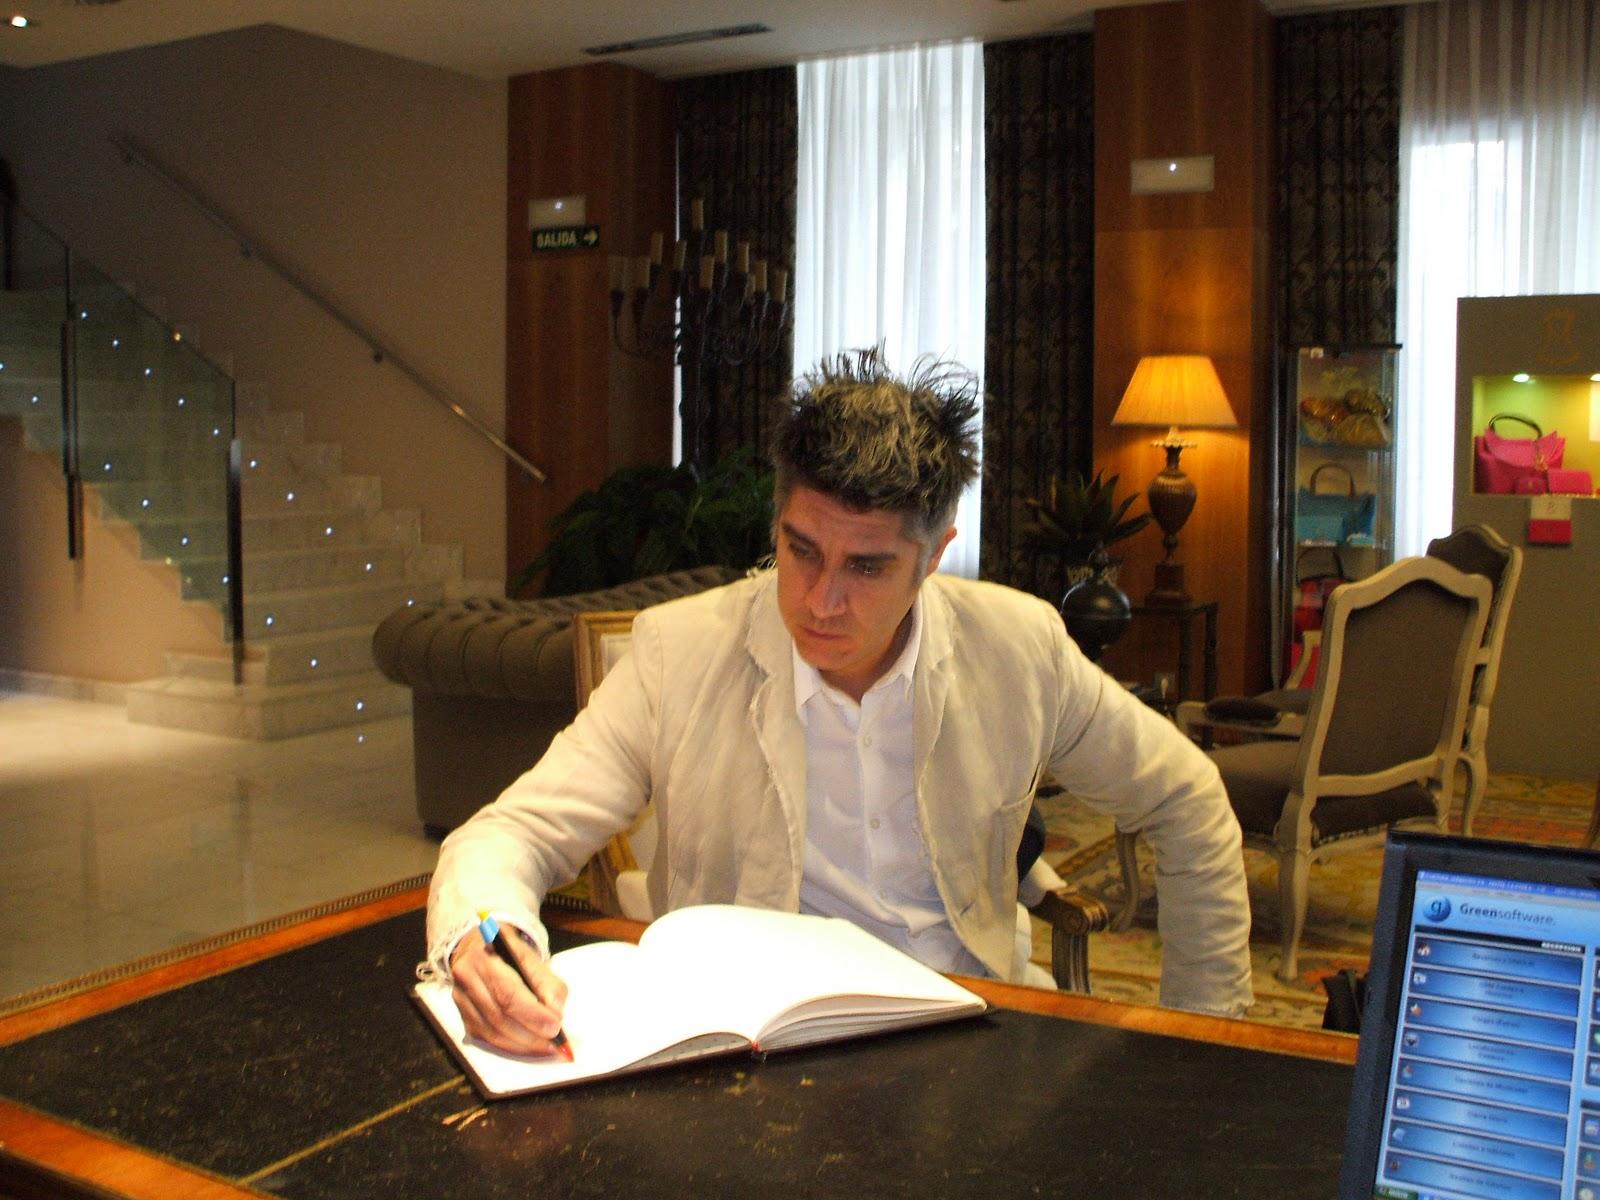 L h ghp alejandro aravena for Alejandro aravena arquitecto